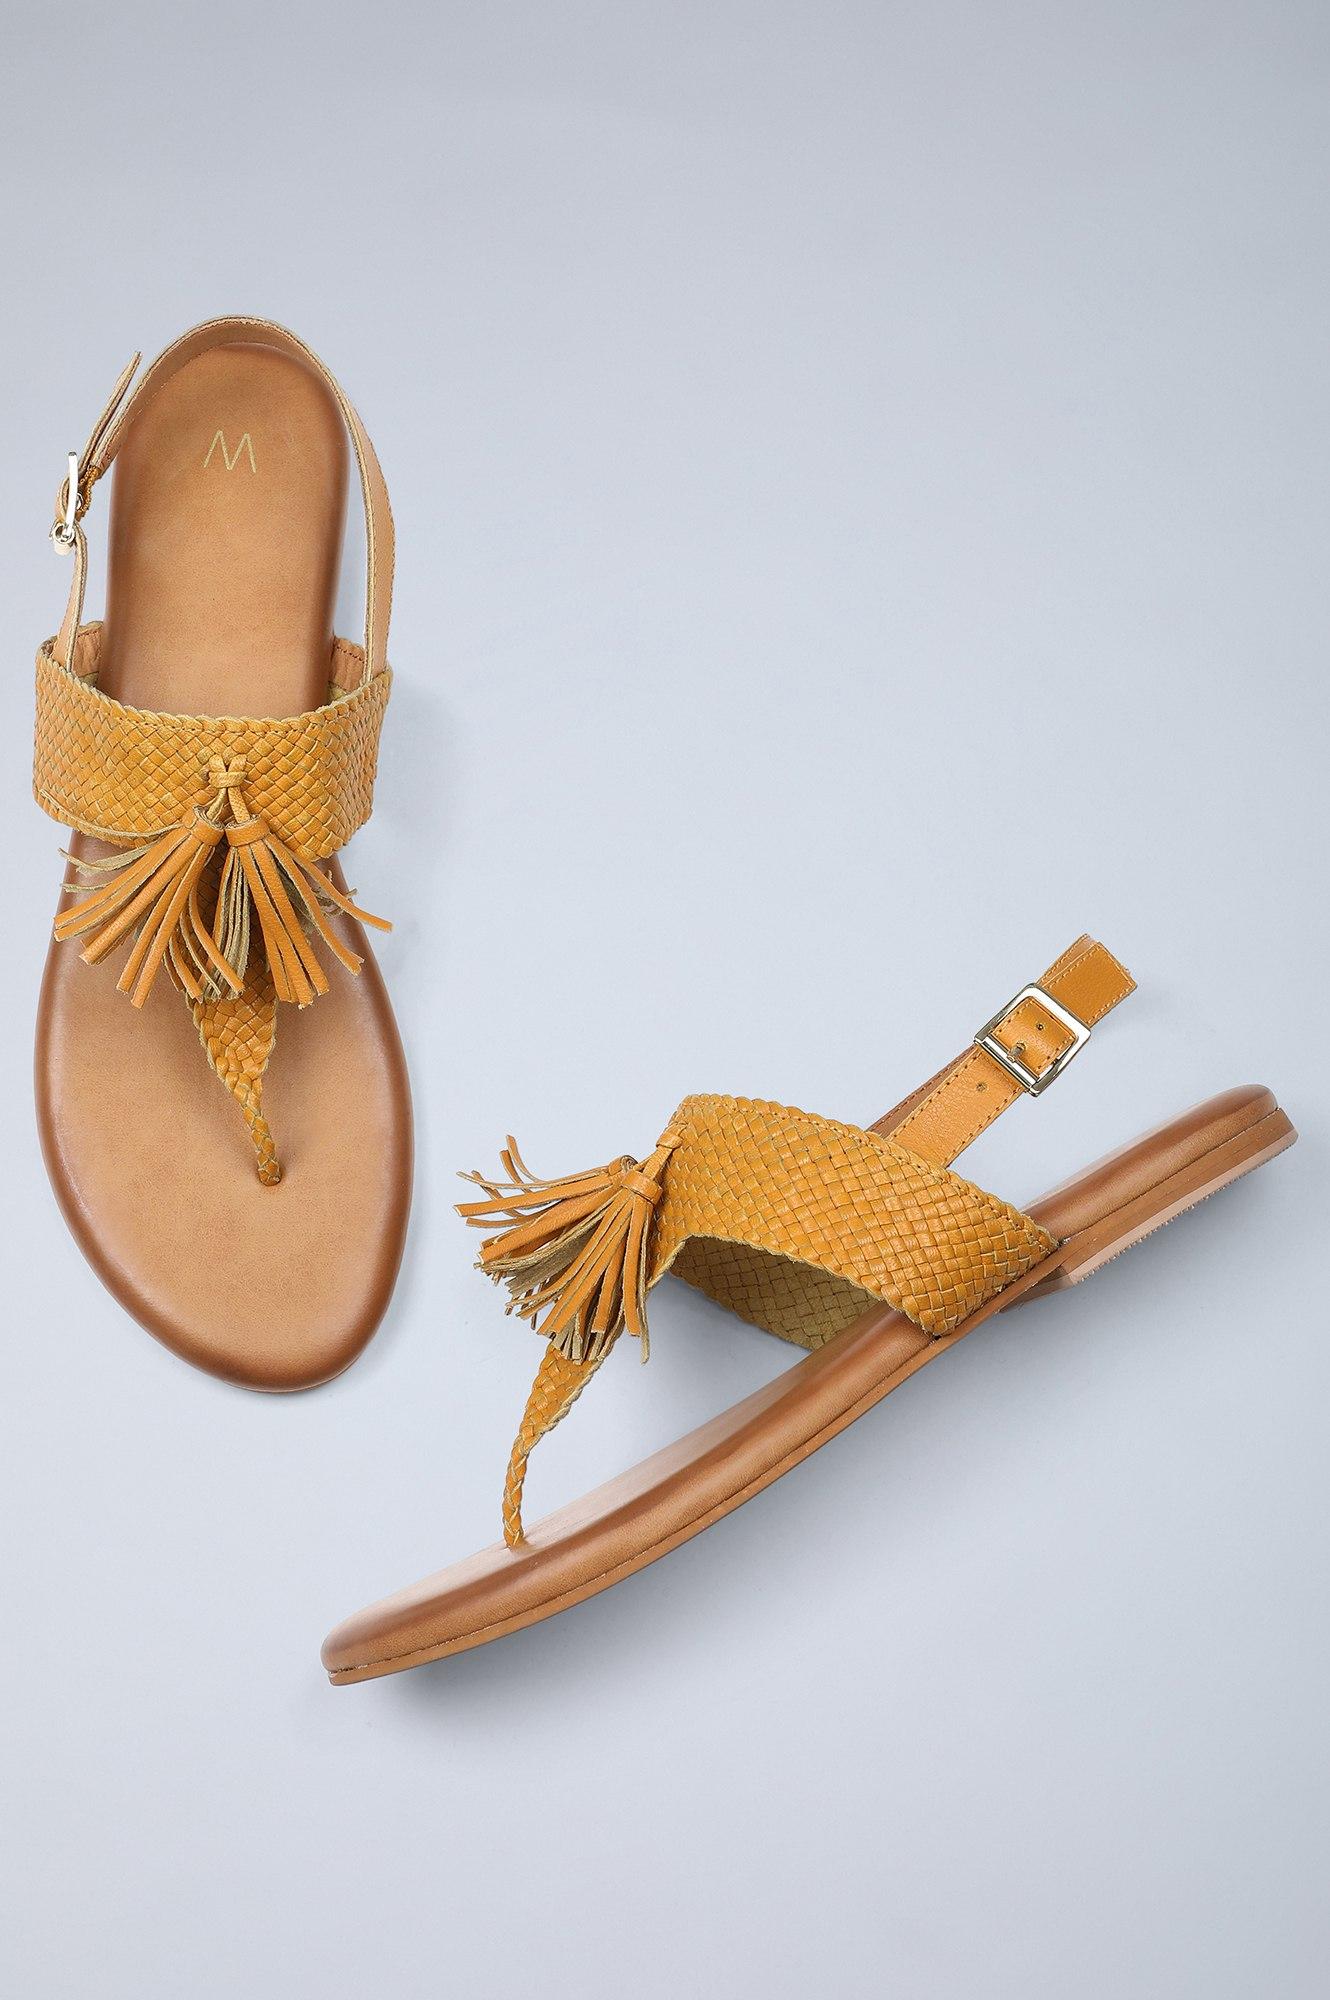 W | Almond Toe Woven Design Flat